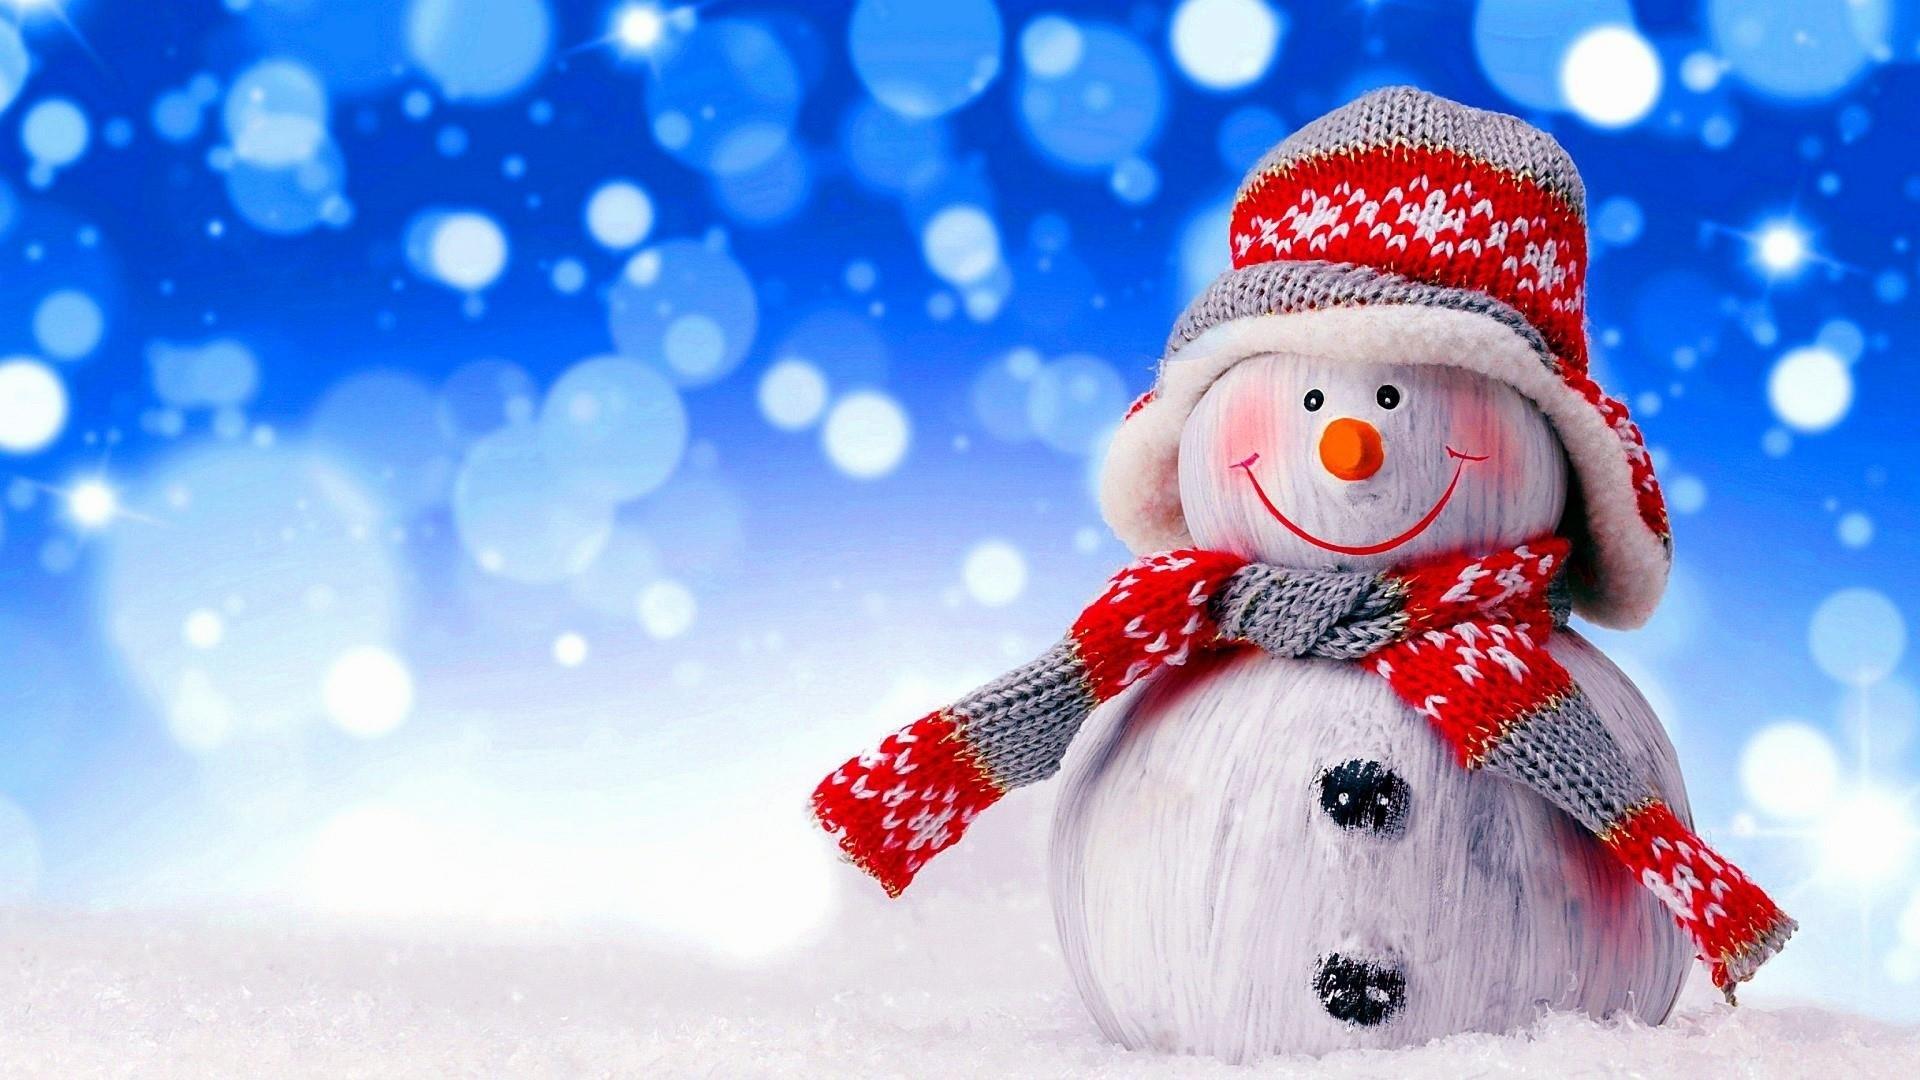 Snowman hd wallpaper download